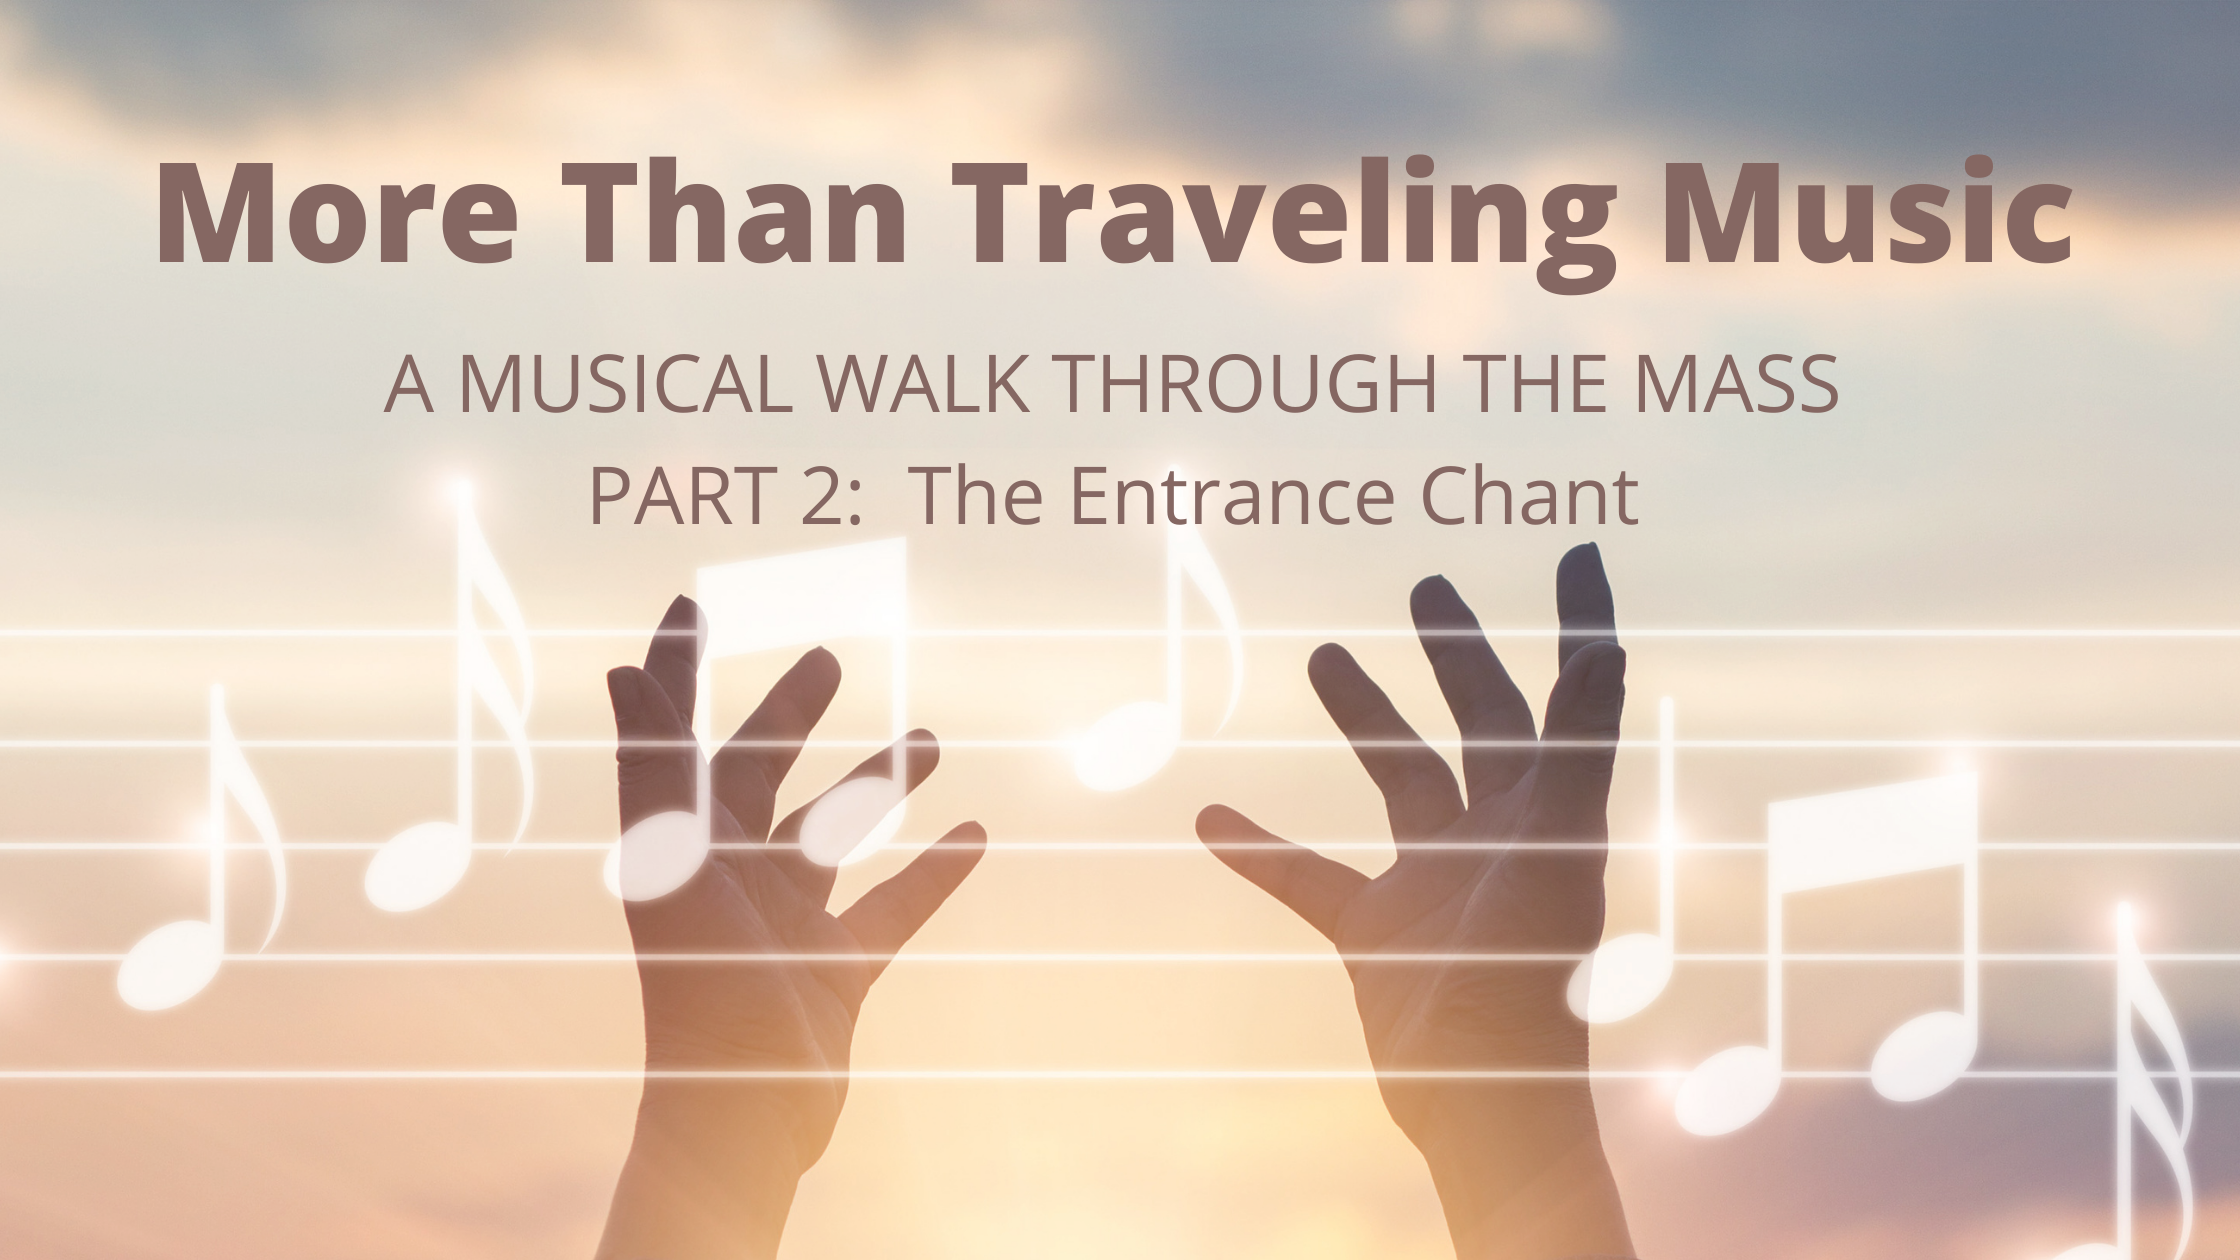 Entrance Chant Musical Walk Through The Mass